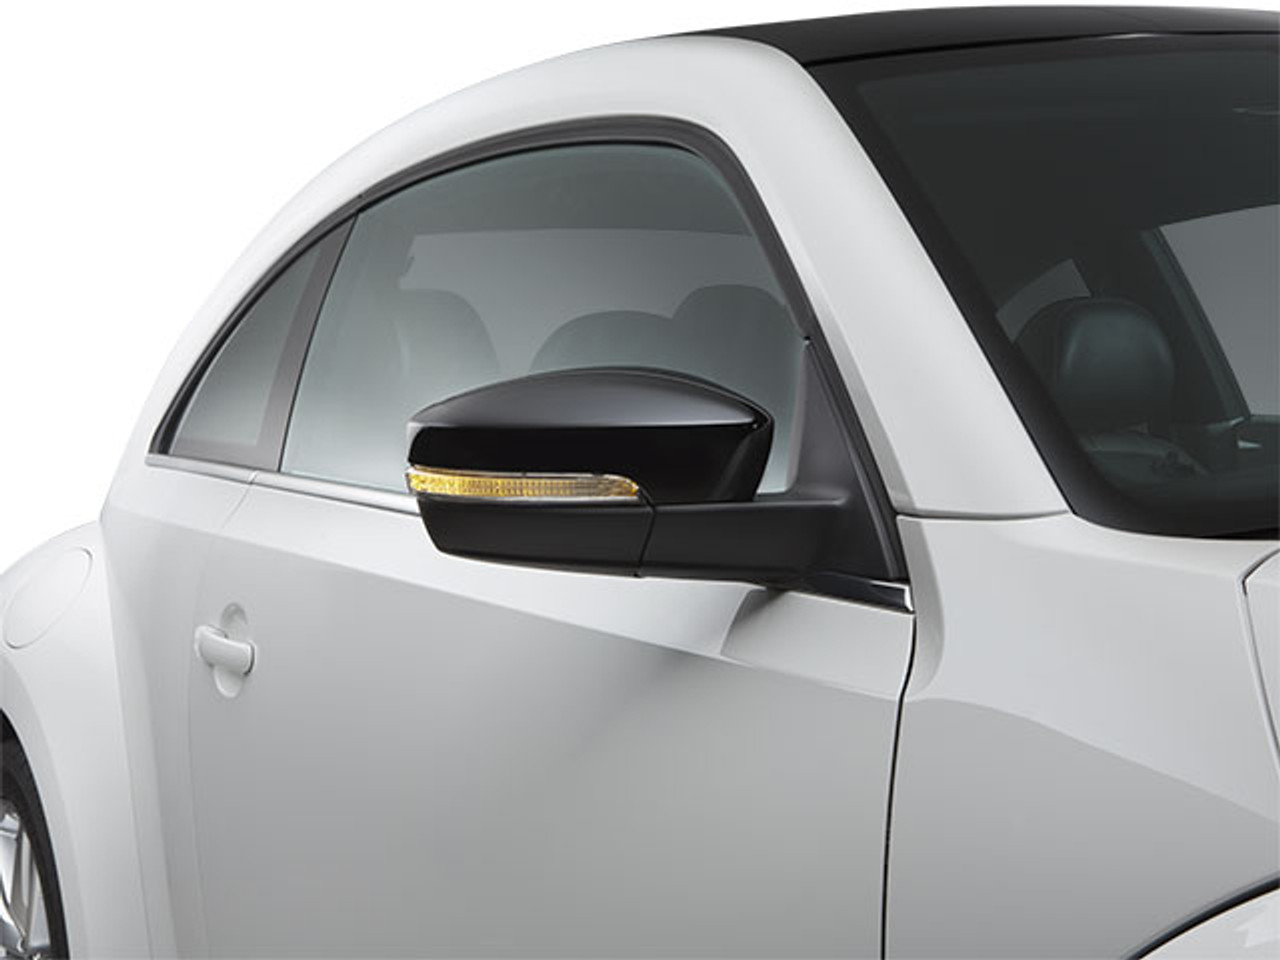 VW Beetle Black Side Mirror Covers   VW Accessories Shop